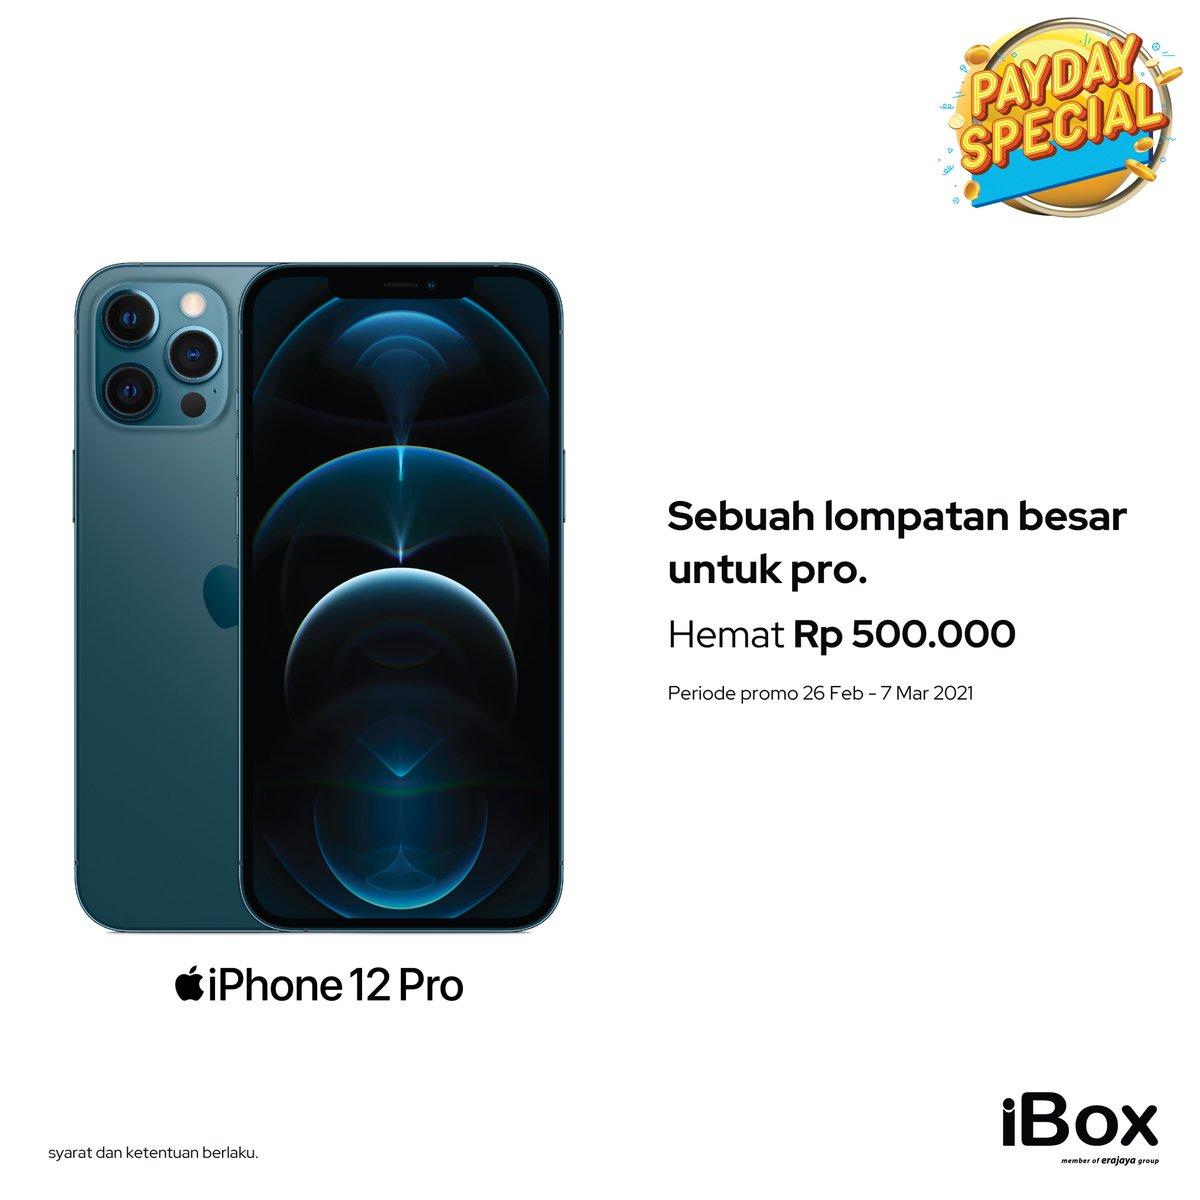 Ibox Iboxindonesia Twitter